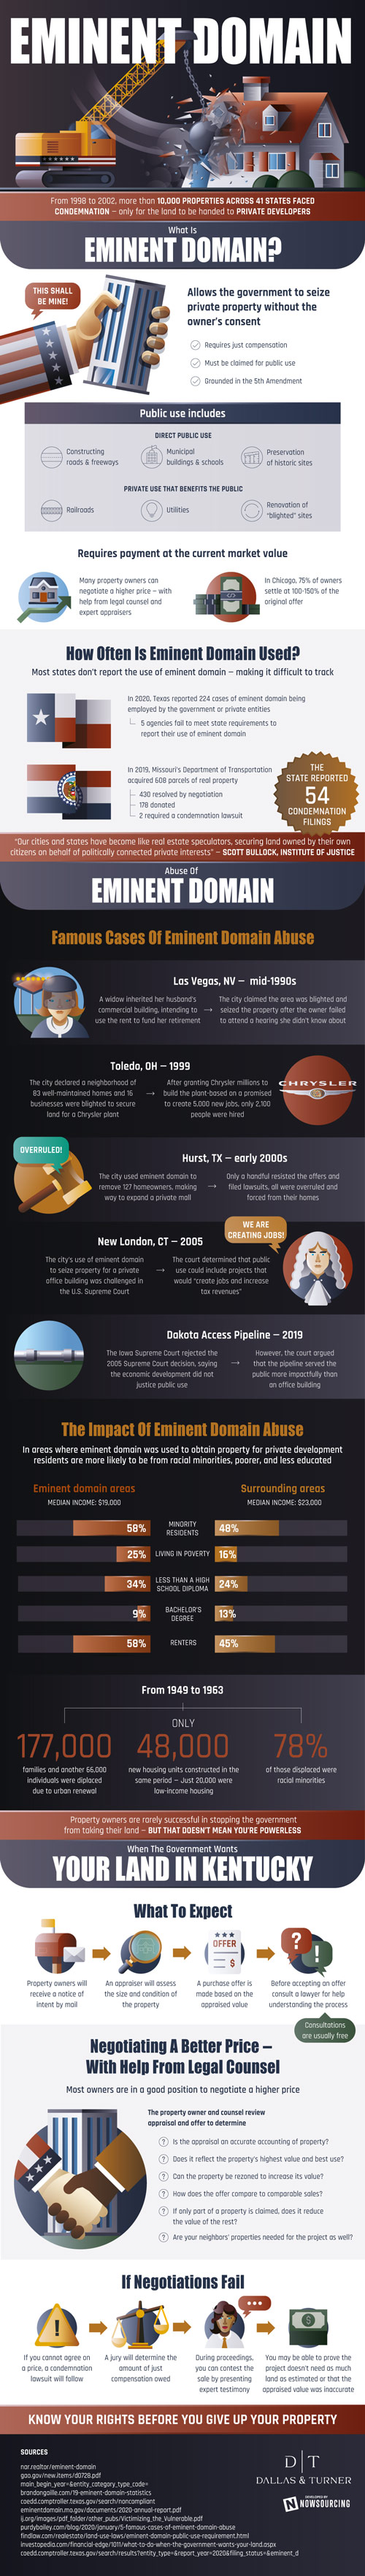 Eminent Domain Explained [Infographic]